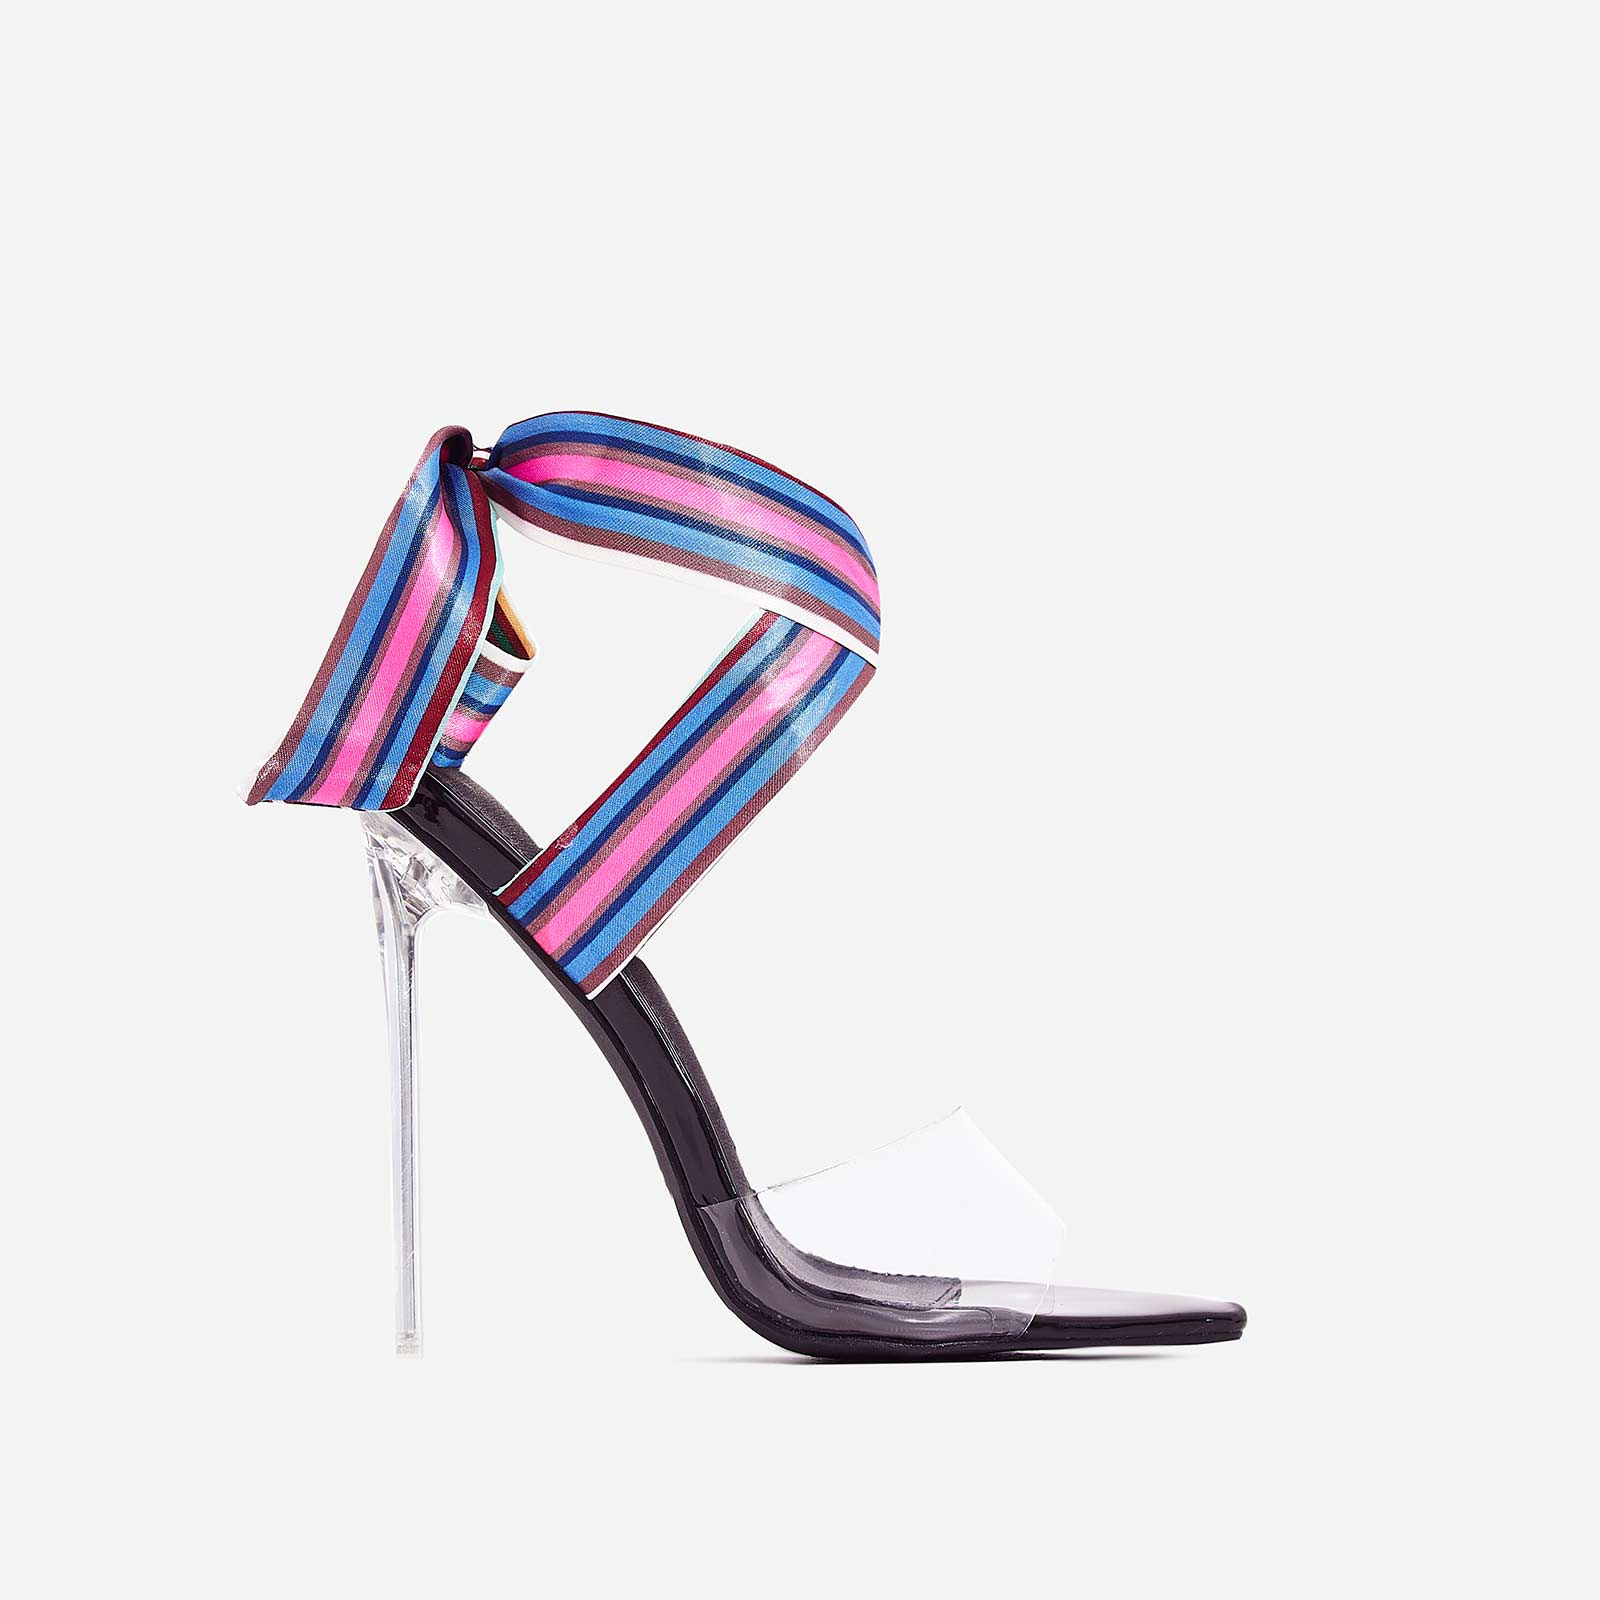 Bibi Striped Print Ribbon Lace Up Perspex Heel In Black Patent